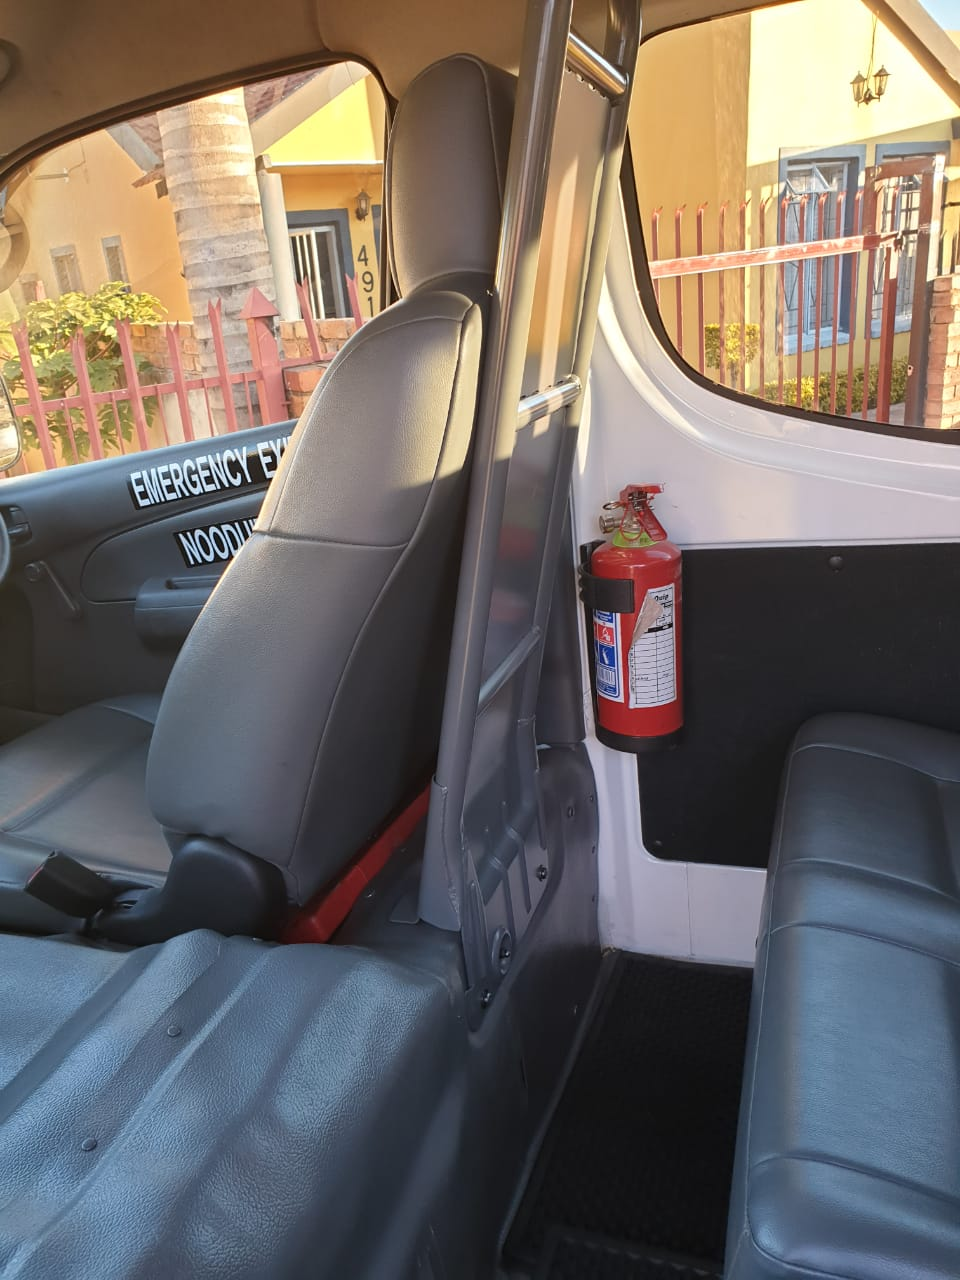 2015 Nissan NV350 panel van wide body 2.5i